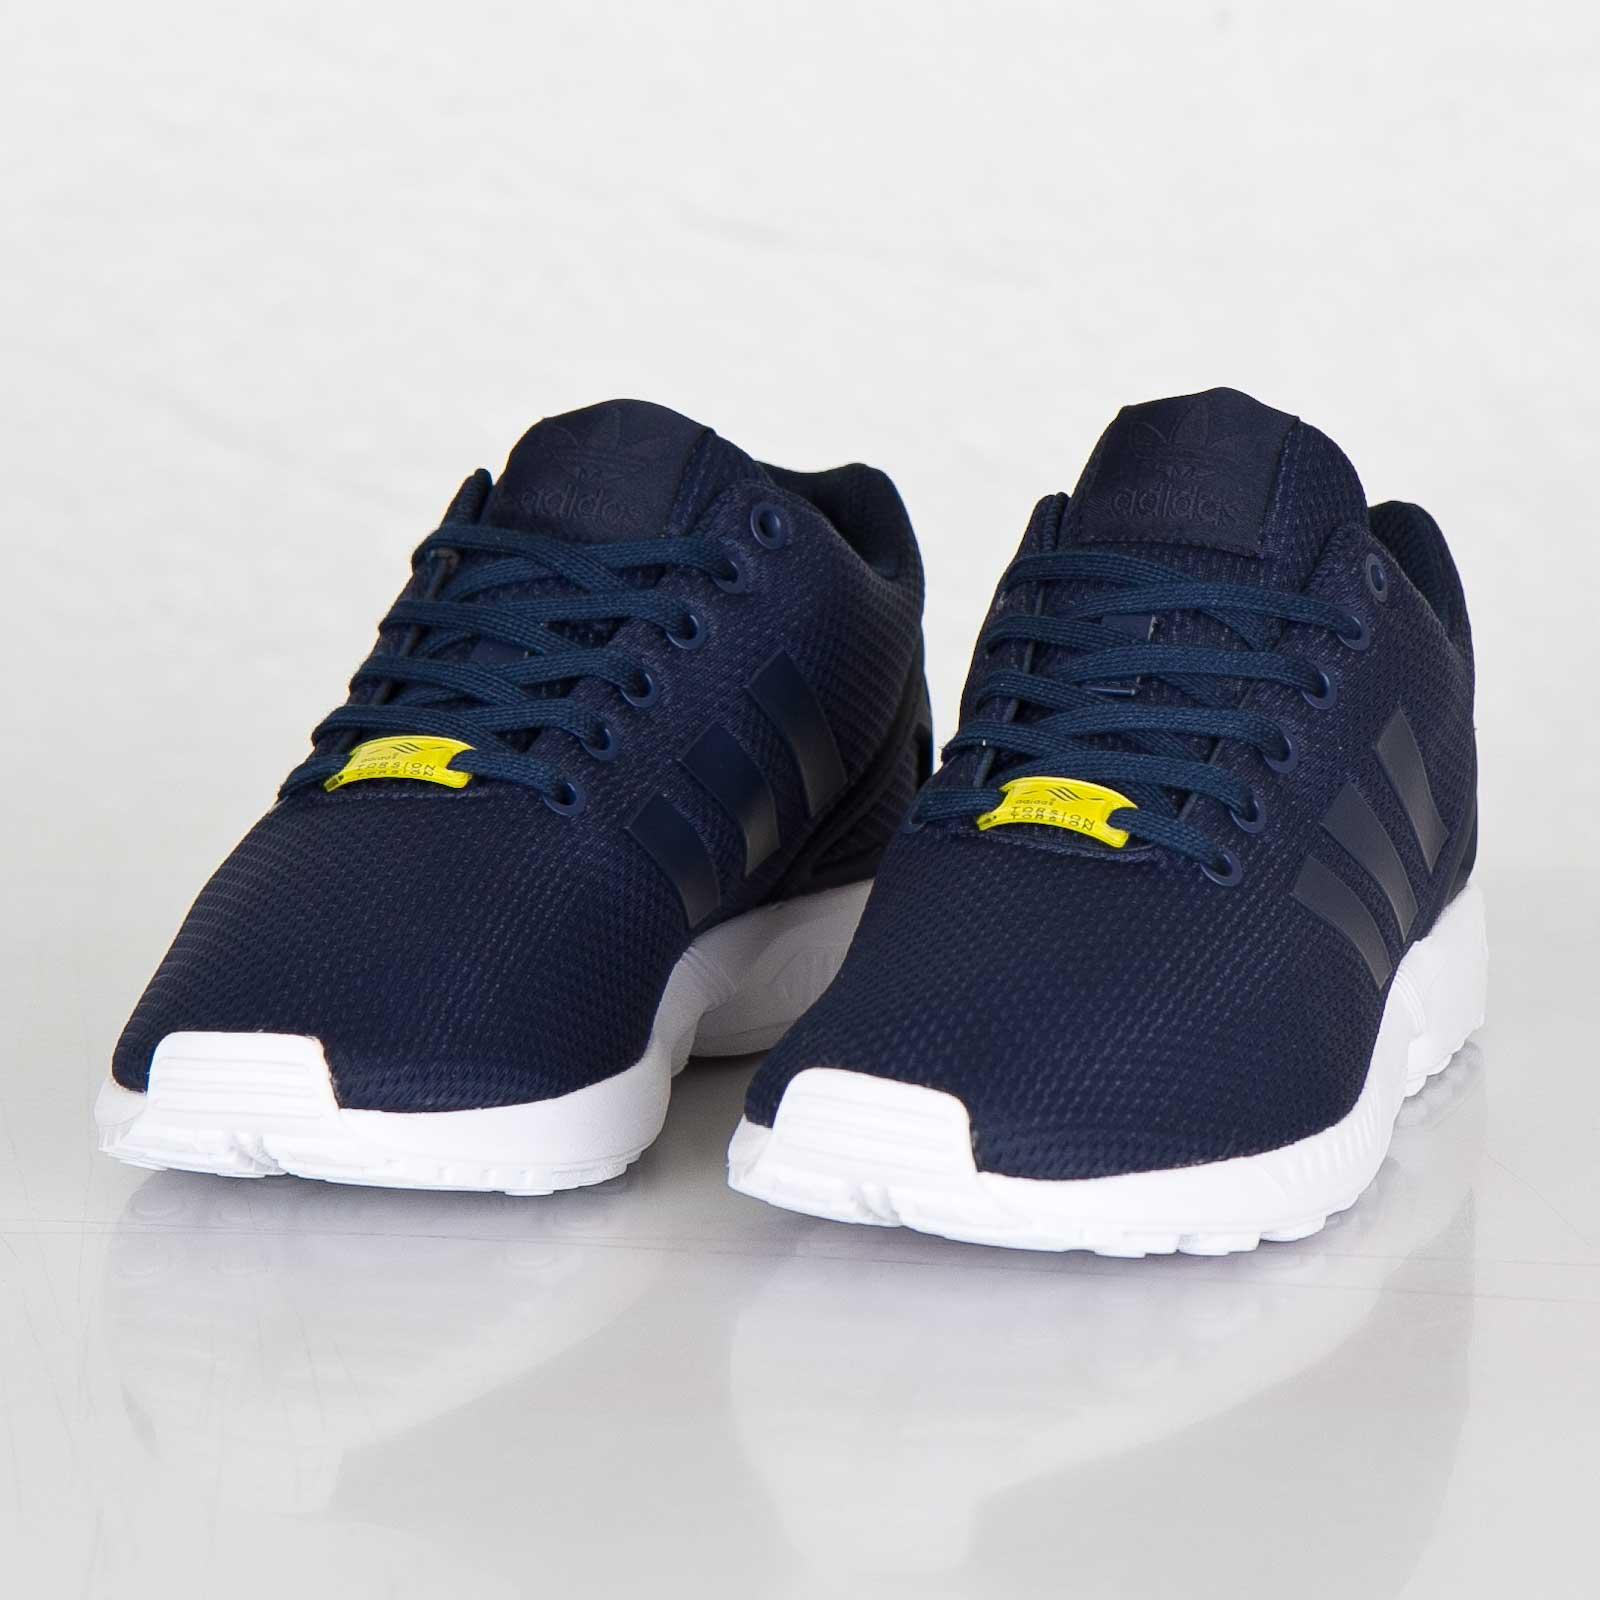 new concept 52a5a be8cd adidas ZX Flux - M19841 - Sneakersnstuff   sneakers   streetwear online  since 1999